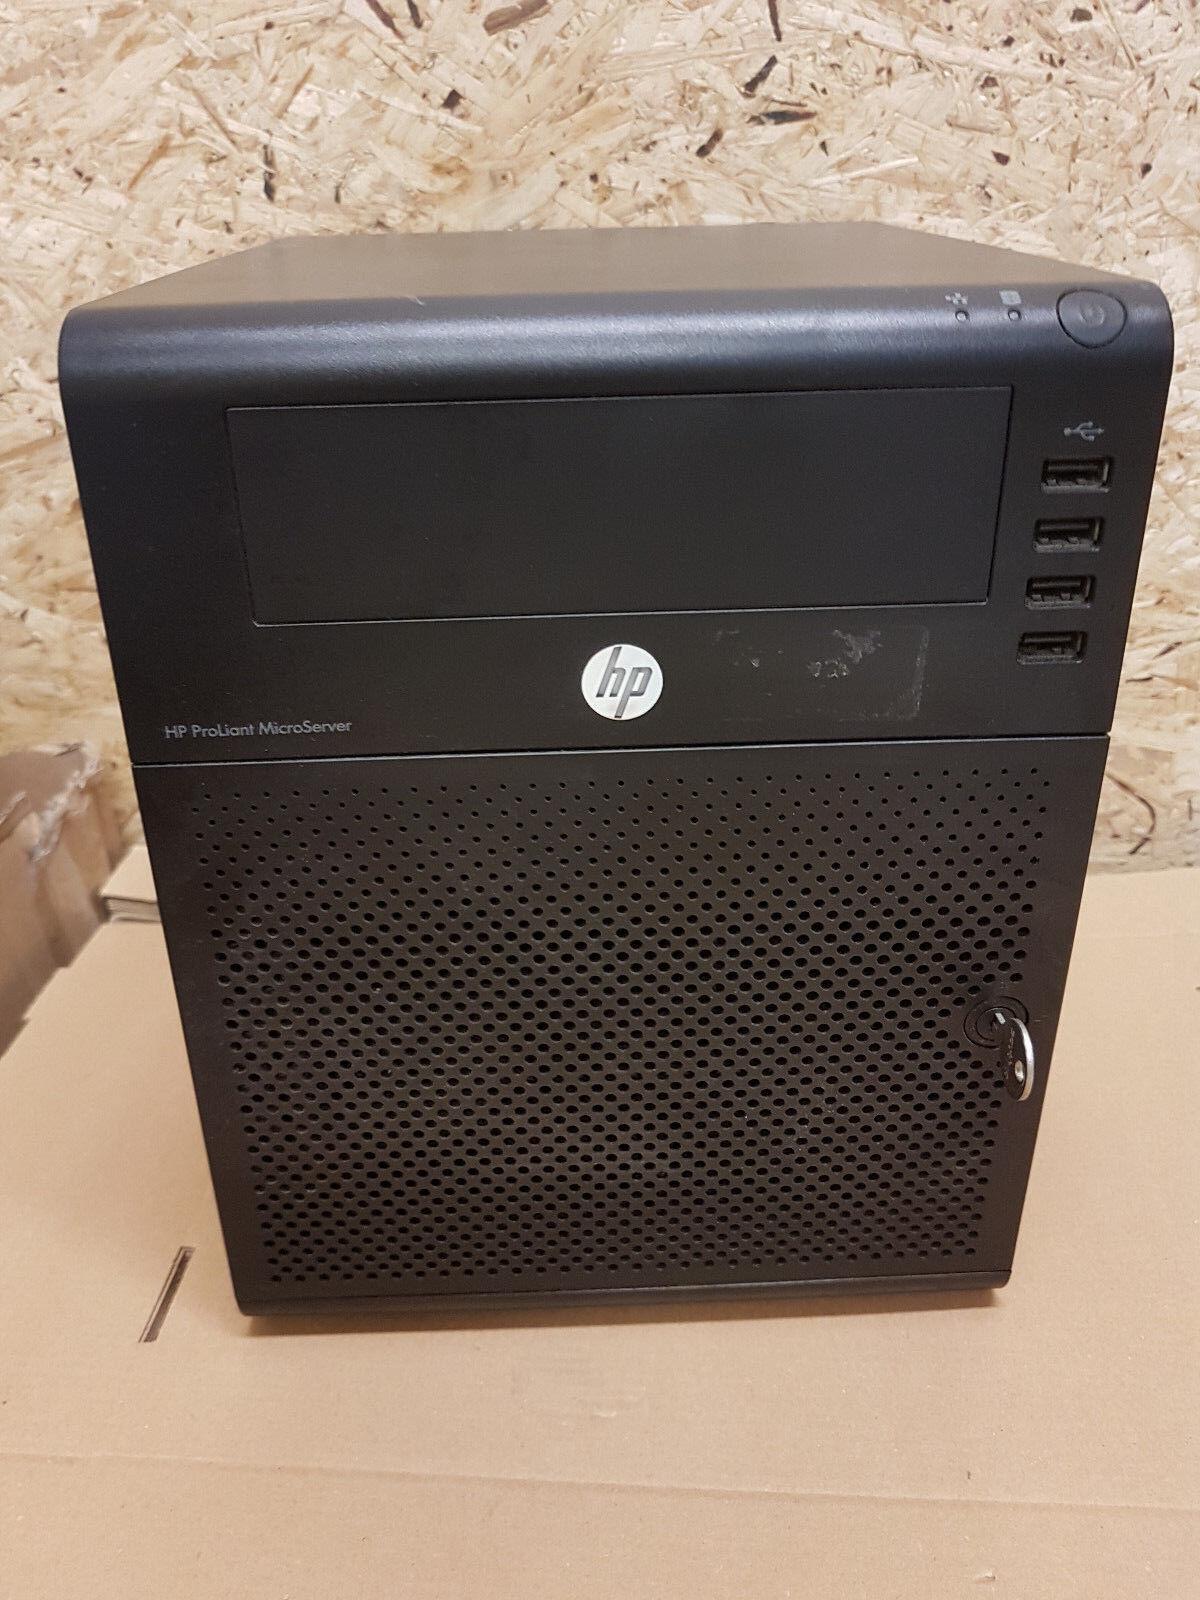 HP ProLiant MicroServer G7 N40L 2GB RAM, ,AMD Turion II   Home Server |MS01-n